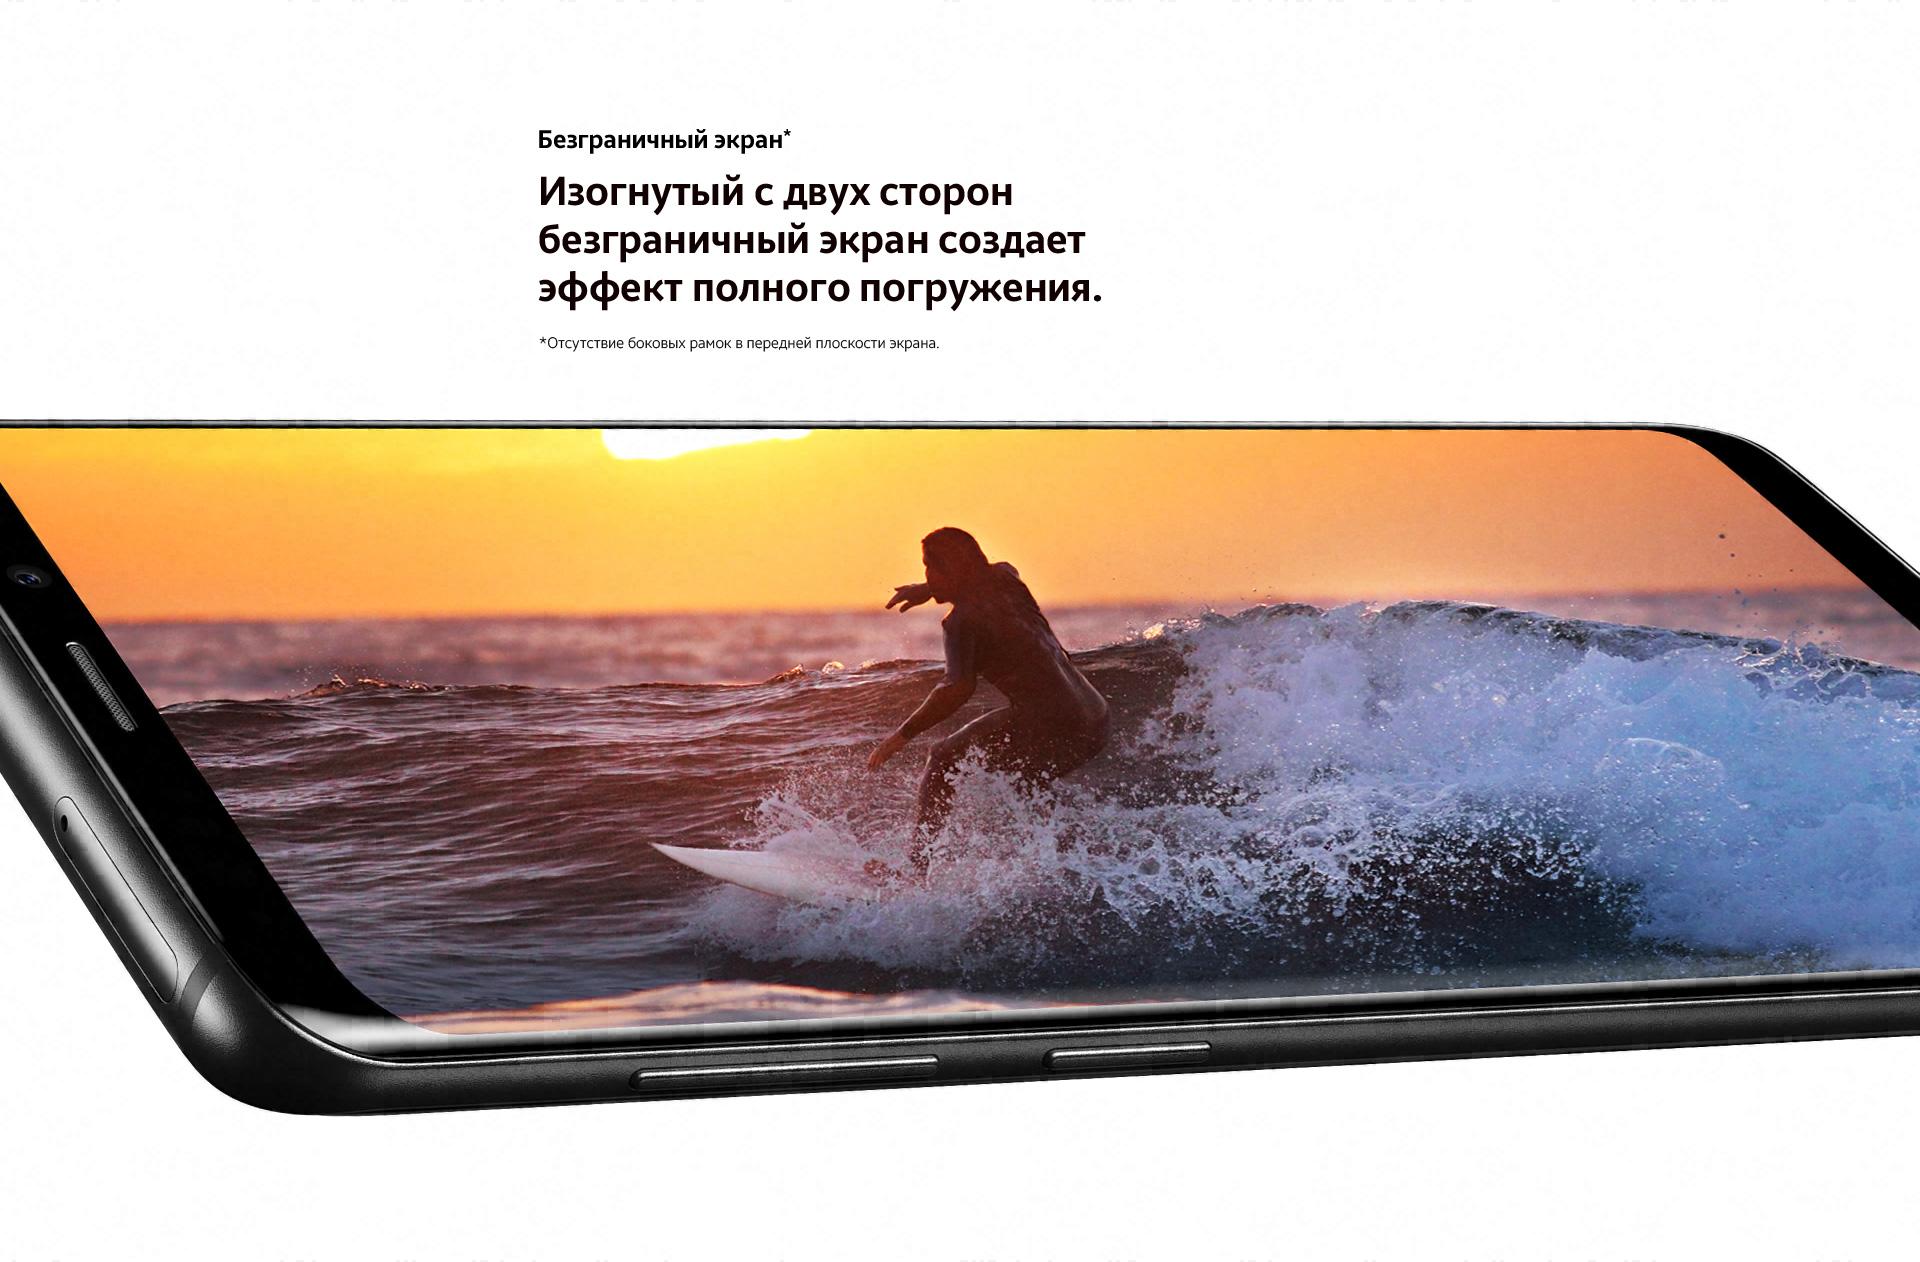 Изогнутый экран в Samsung Galaxy S9 и S9+